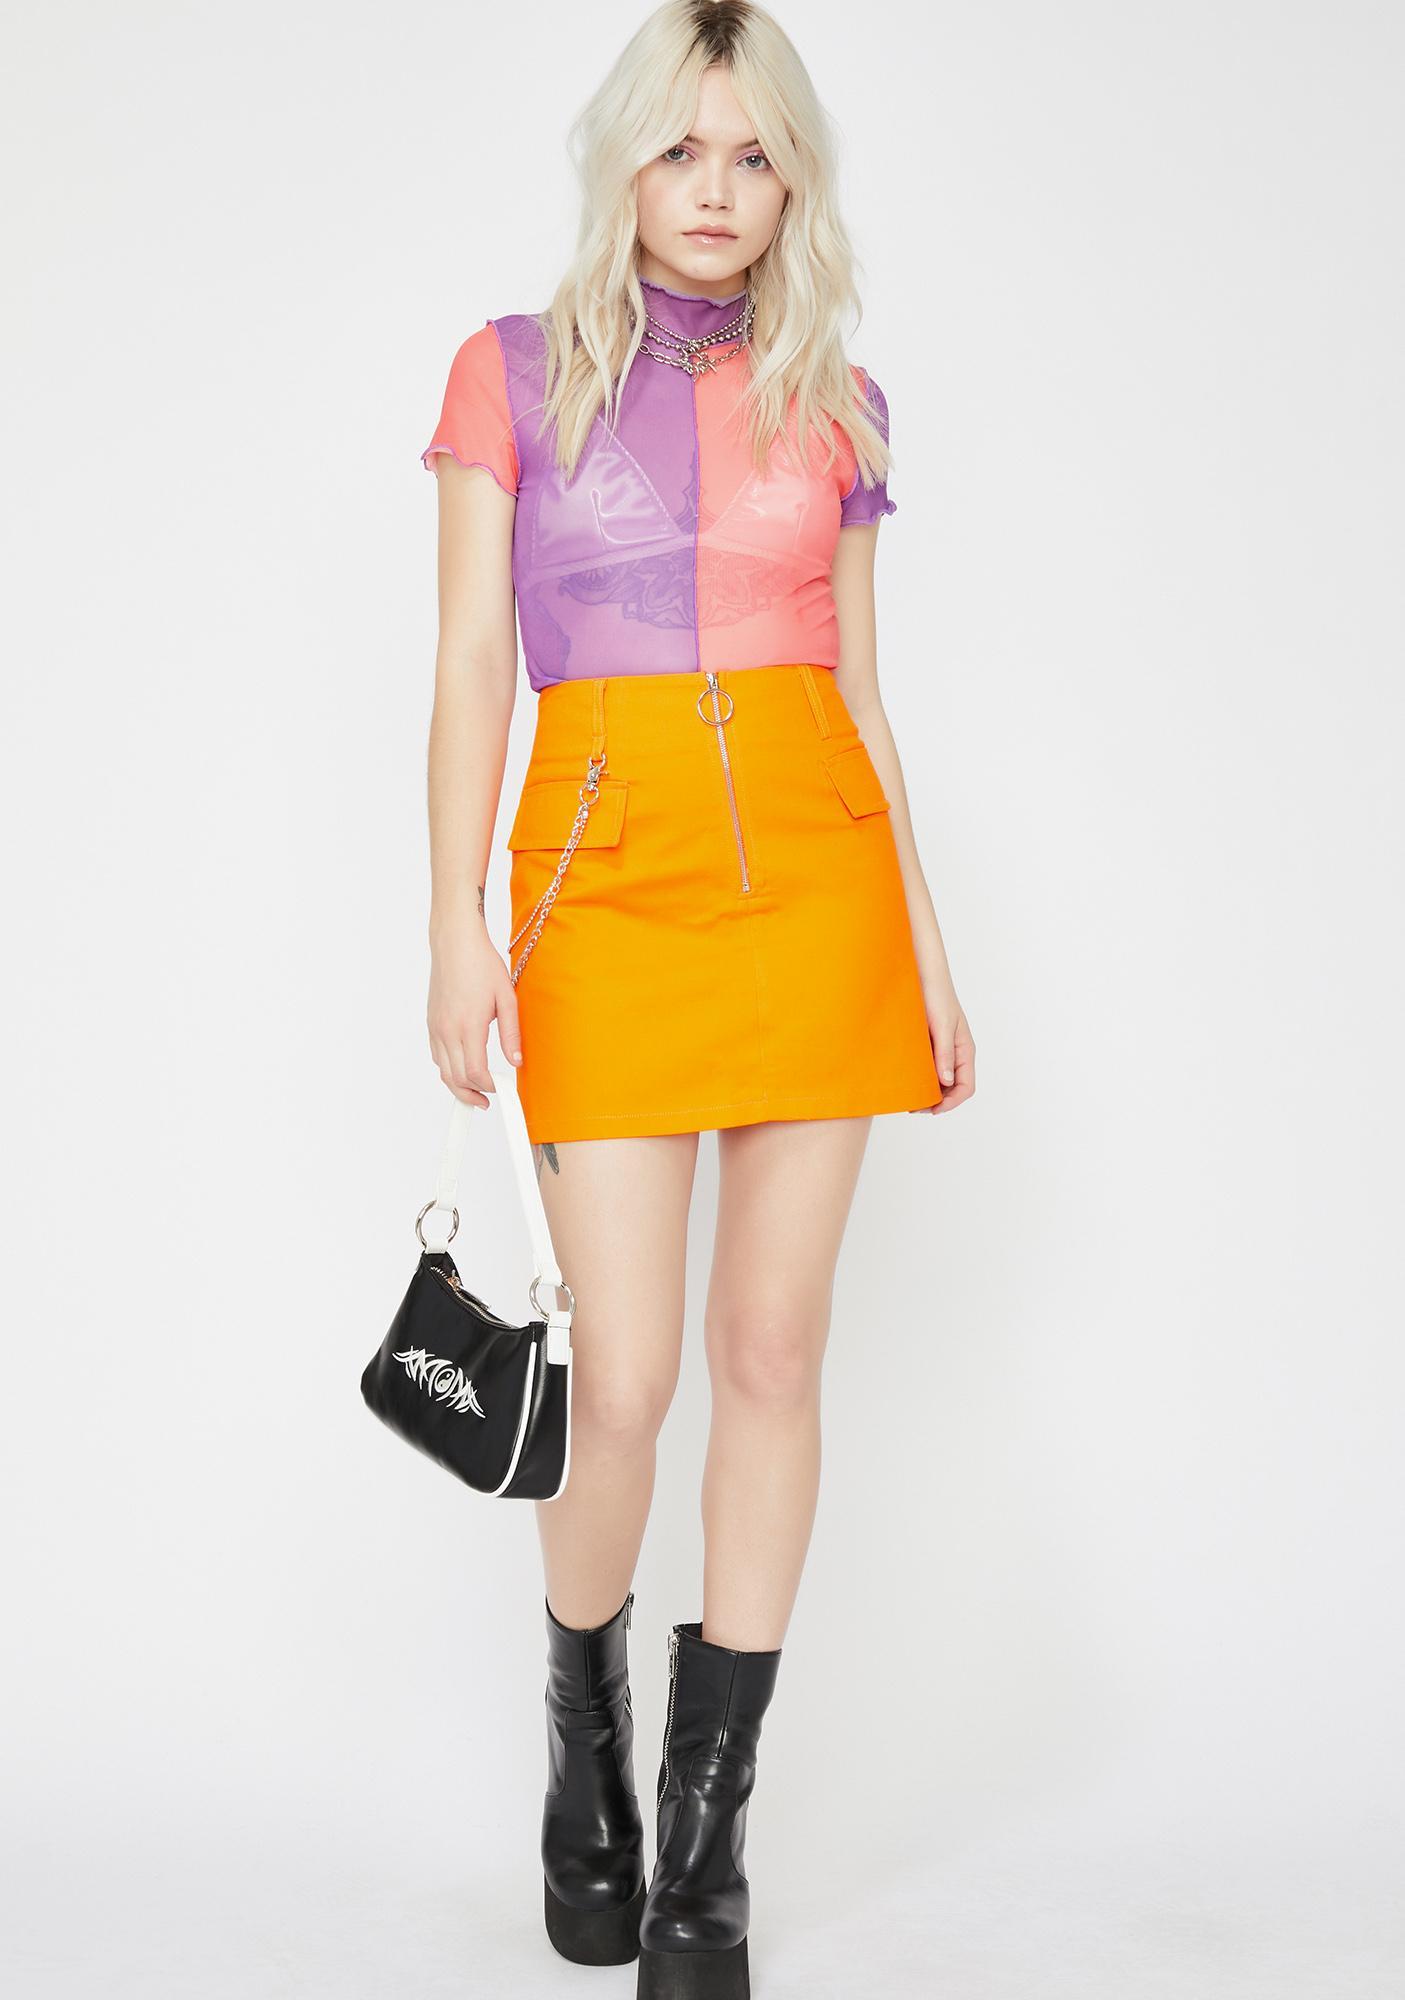 Juicy Trust Fund Mini Skirt